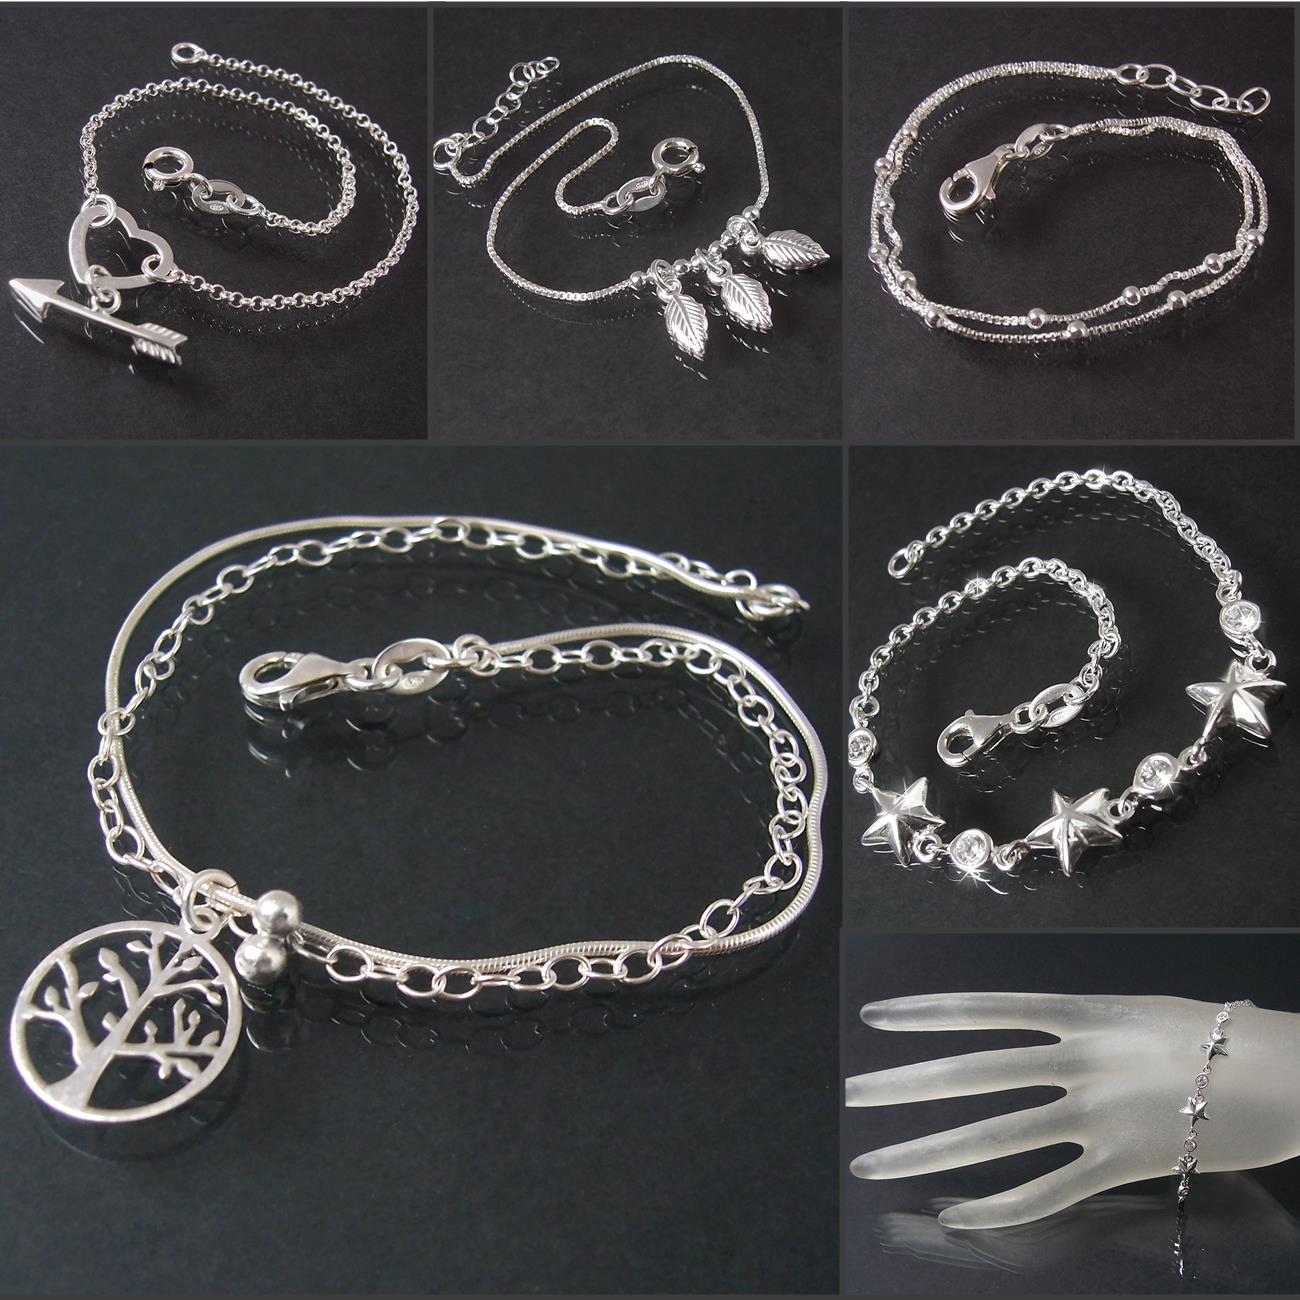 Armband Armkette 925 Silber Zirkonia 17-19cm Herz Lebensbaum Sterne ... bdf585f62f